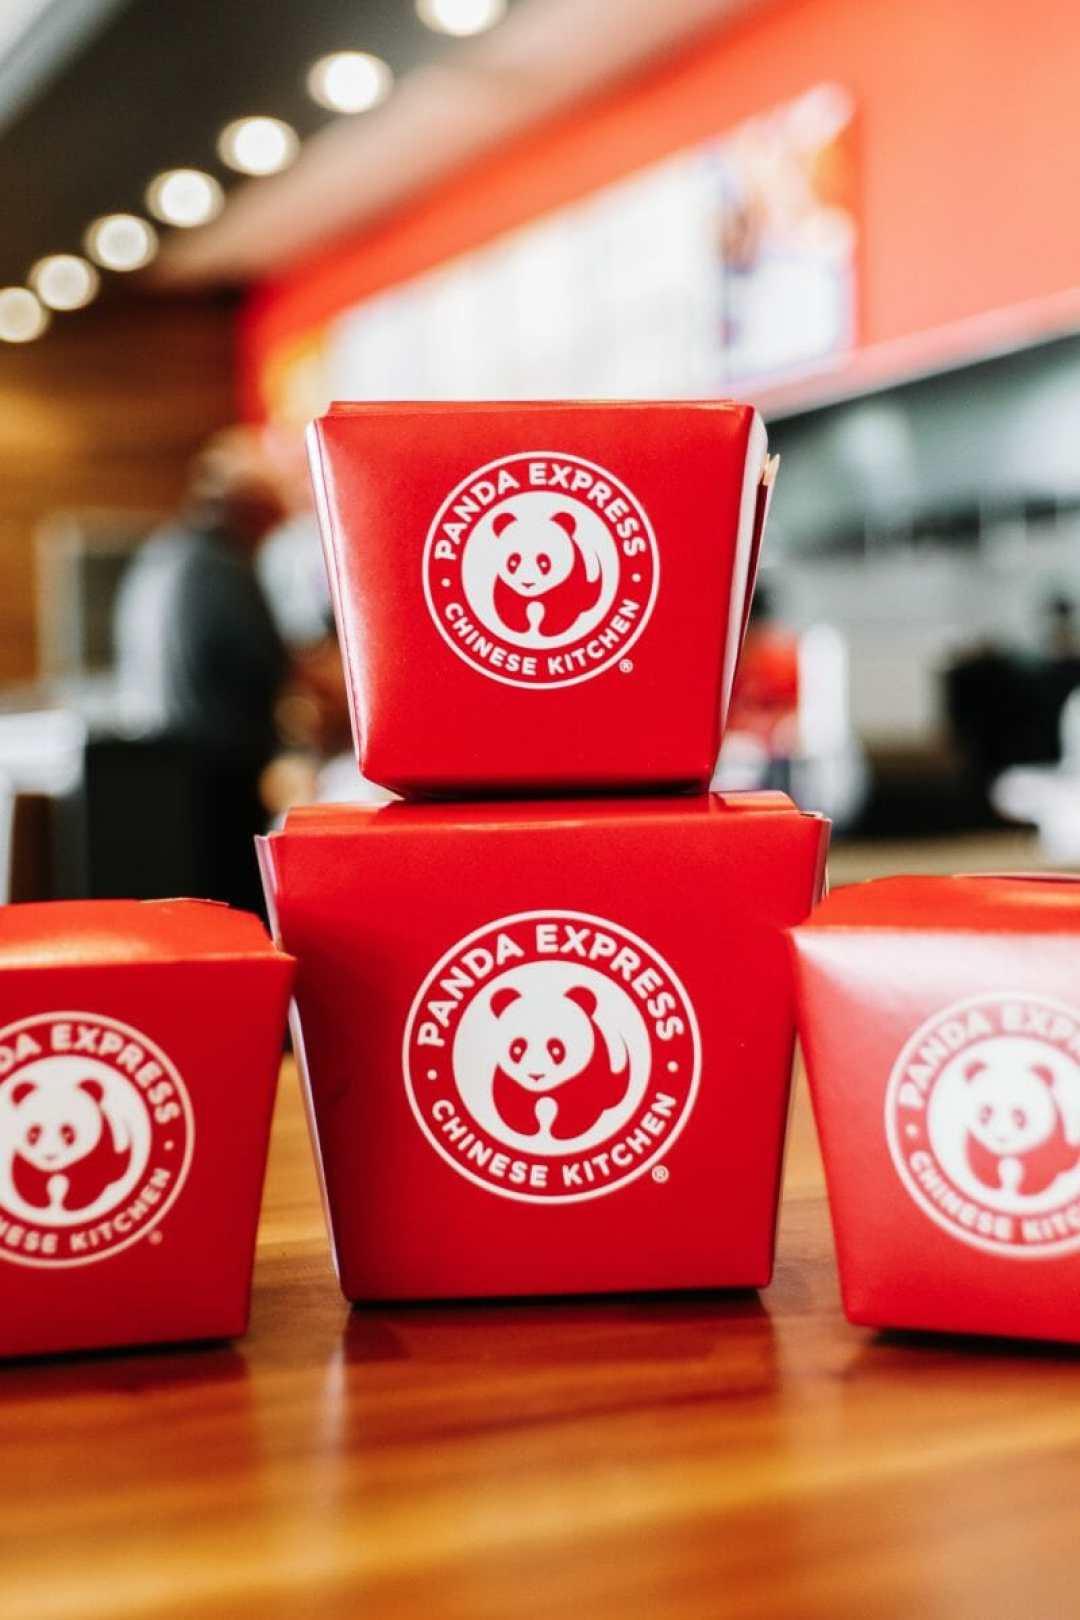 Panda Express - JCP Eats